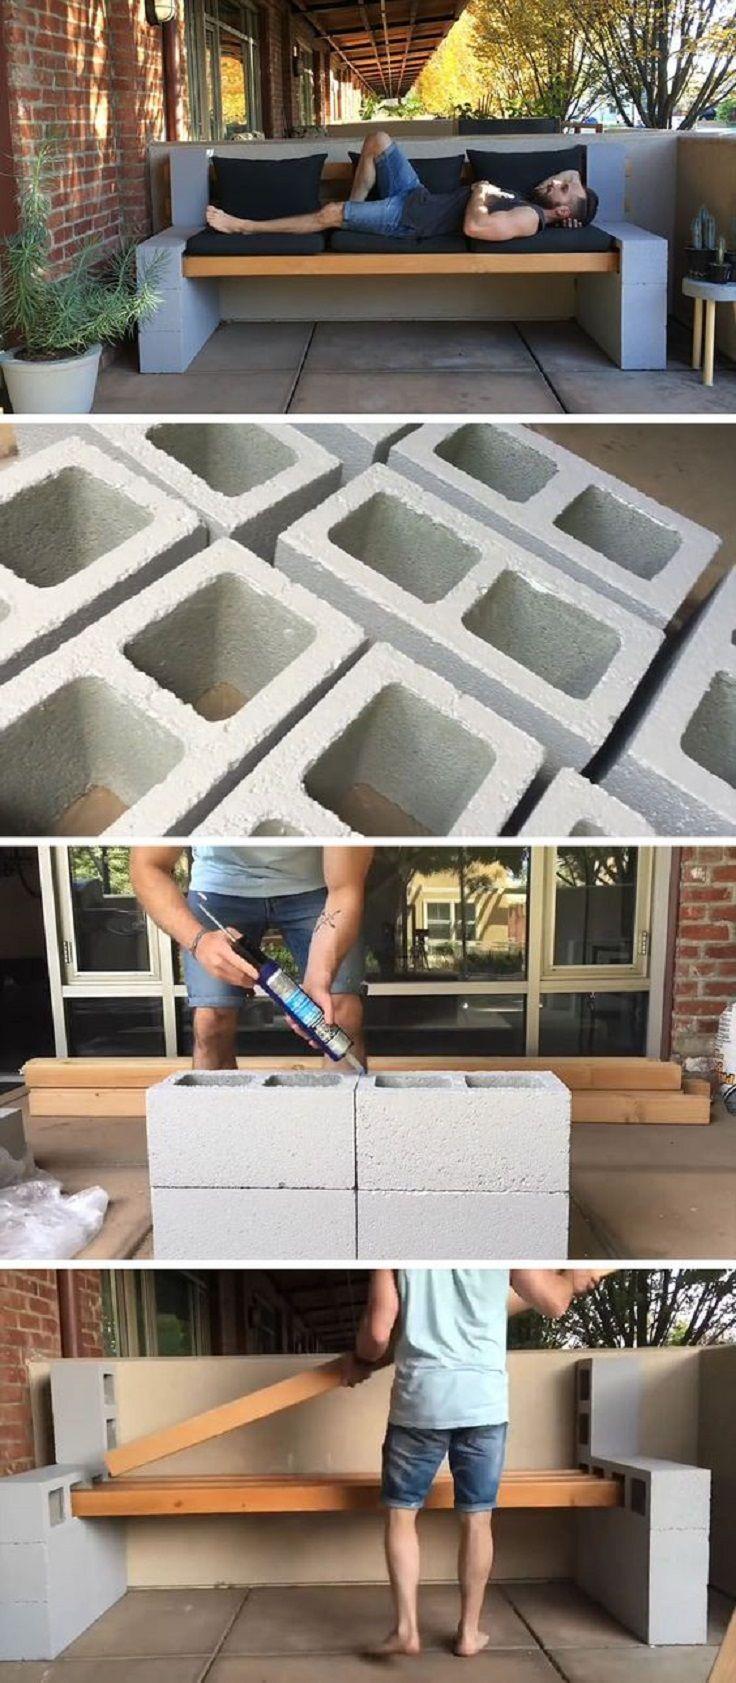 Inexpensive Outdoor DIY Concrete Block Bench – 14 Awesome DIY Backyard Ideas to